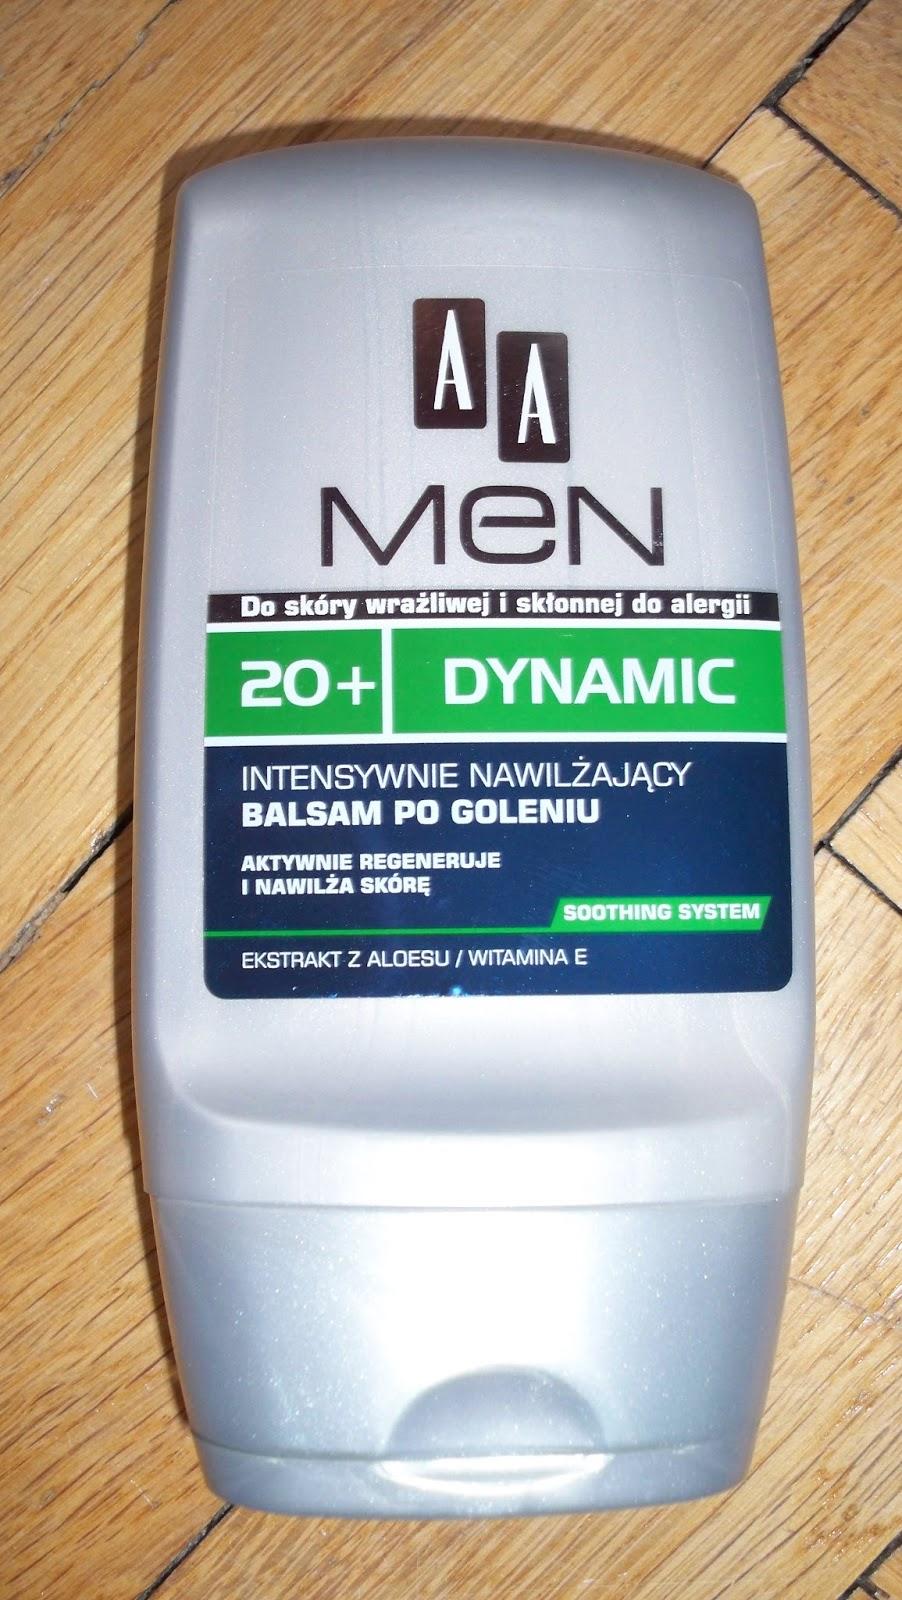 Balsam po goleniu 20+ DYNAMIC firmy AA